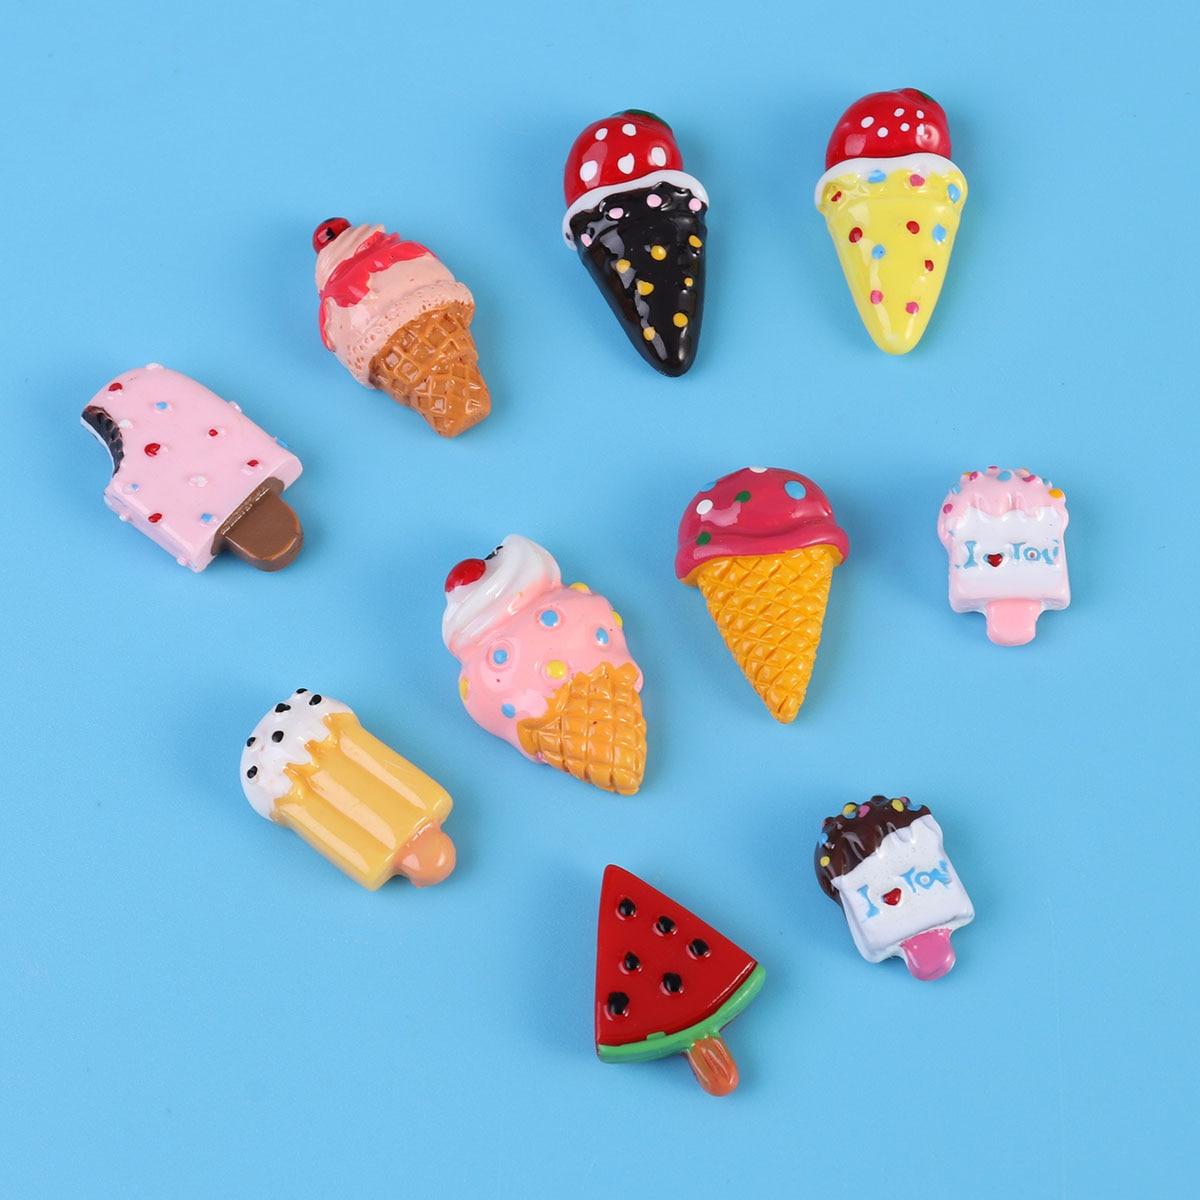 10pcs Dessert Fridge Magnet Ice Cream Fridge Magnets Sticker Decor ...